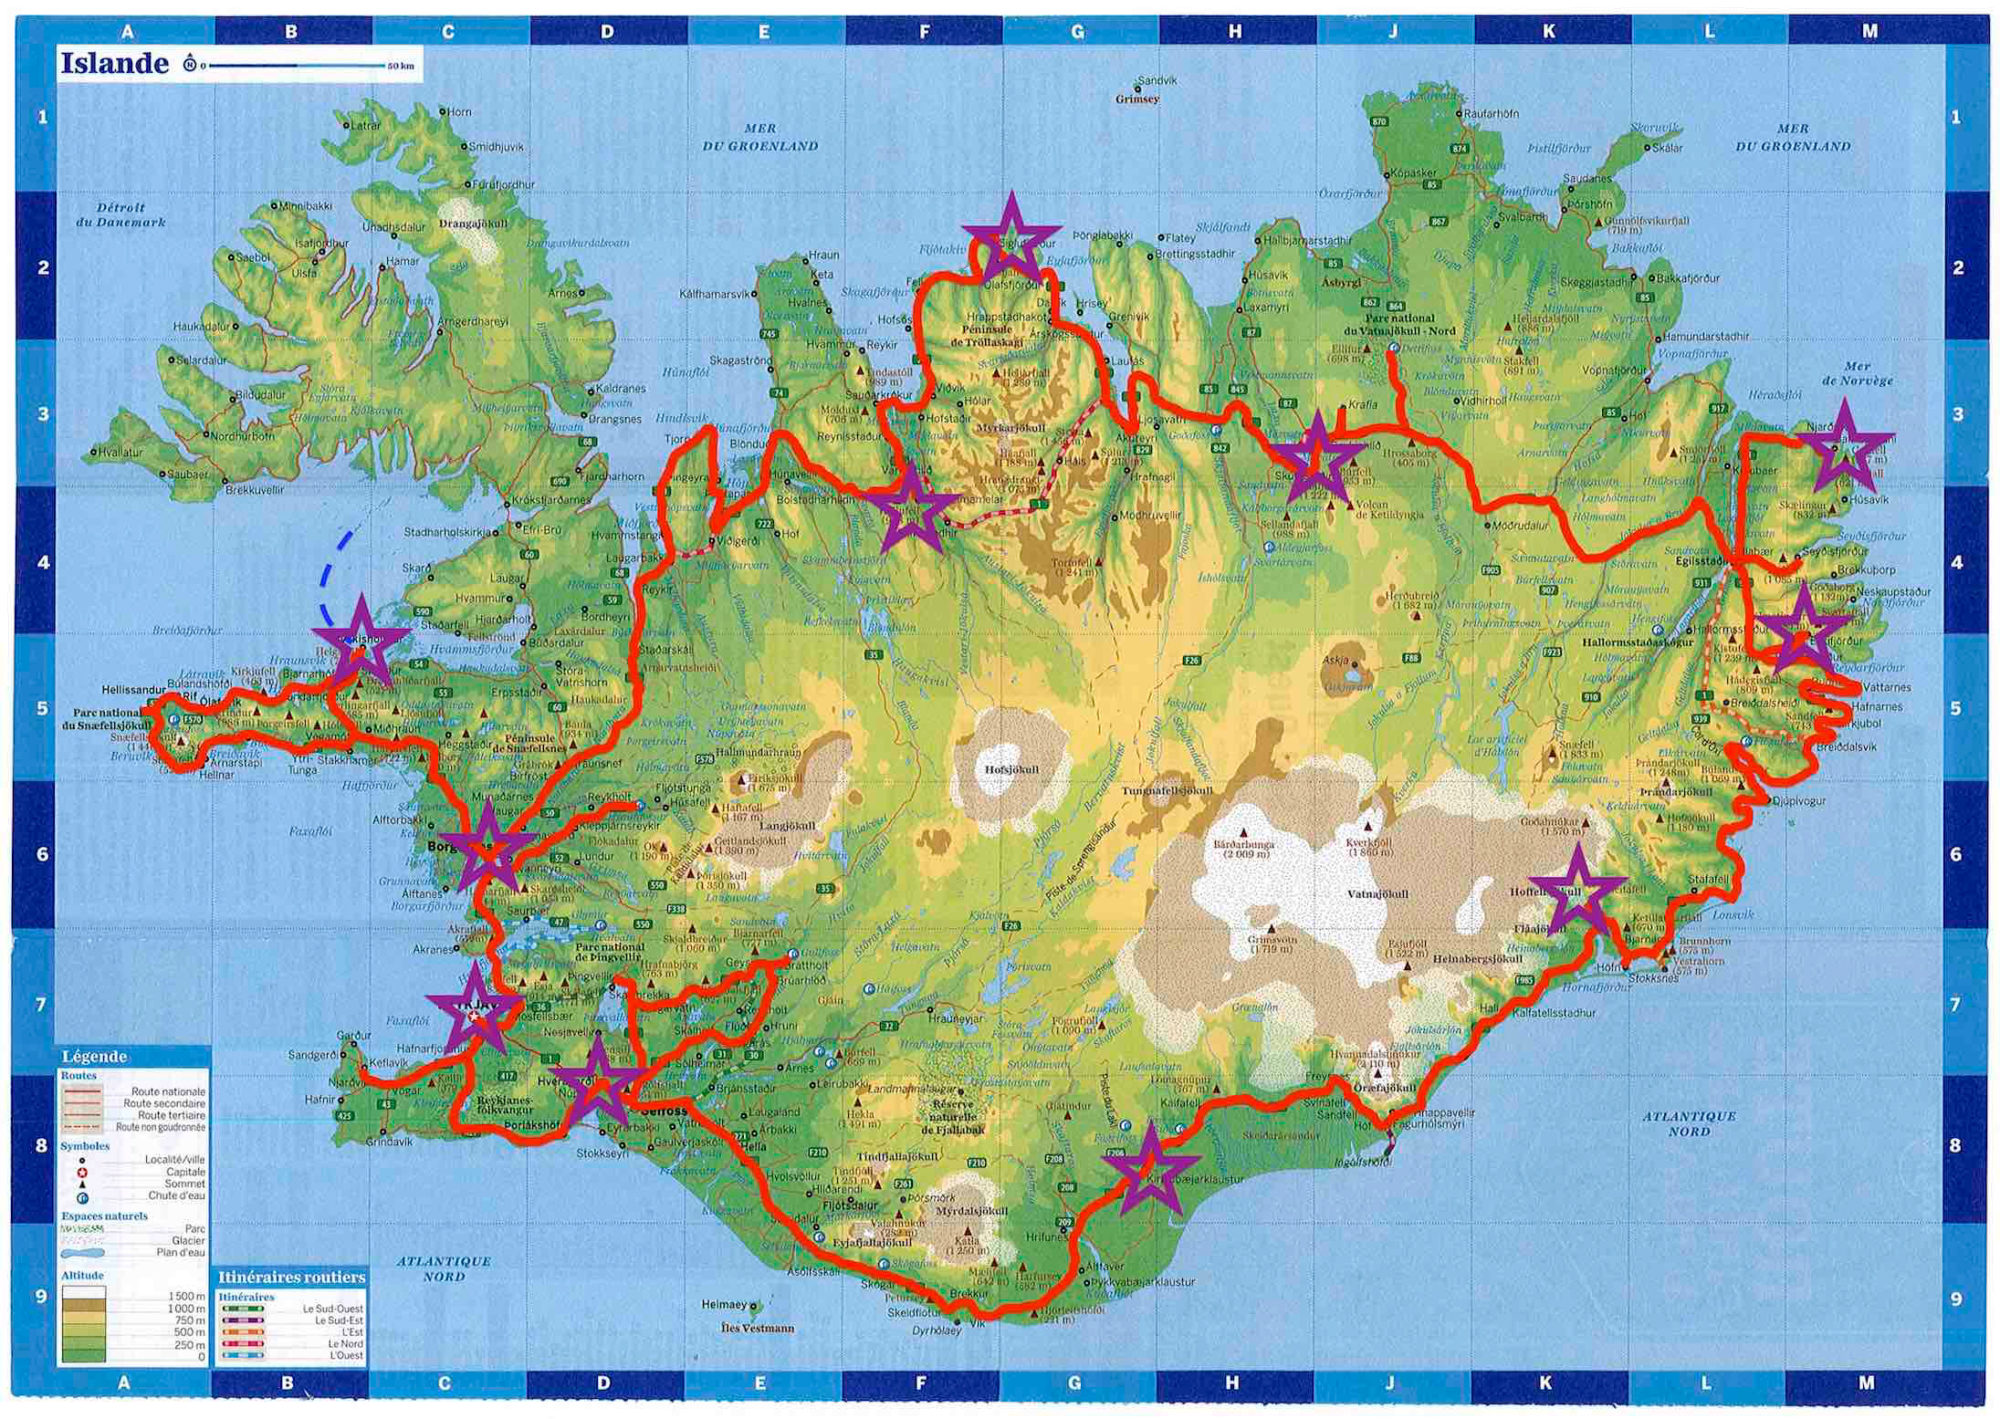 Islande itinéraire